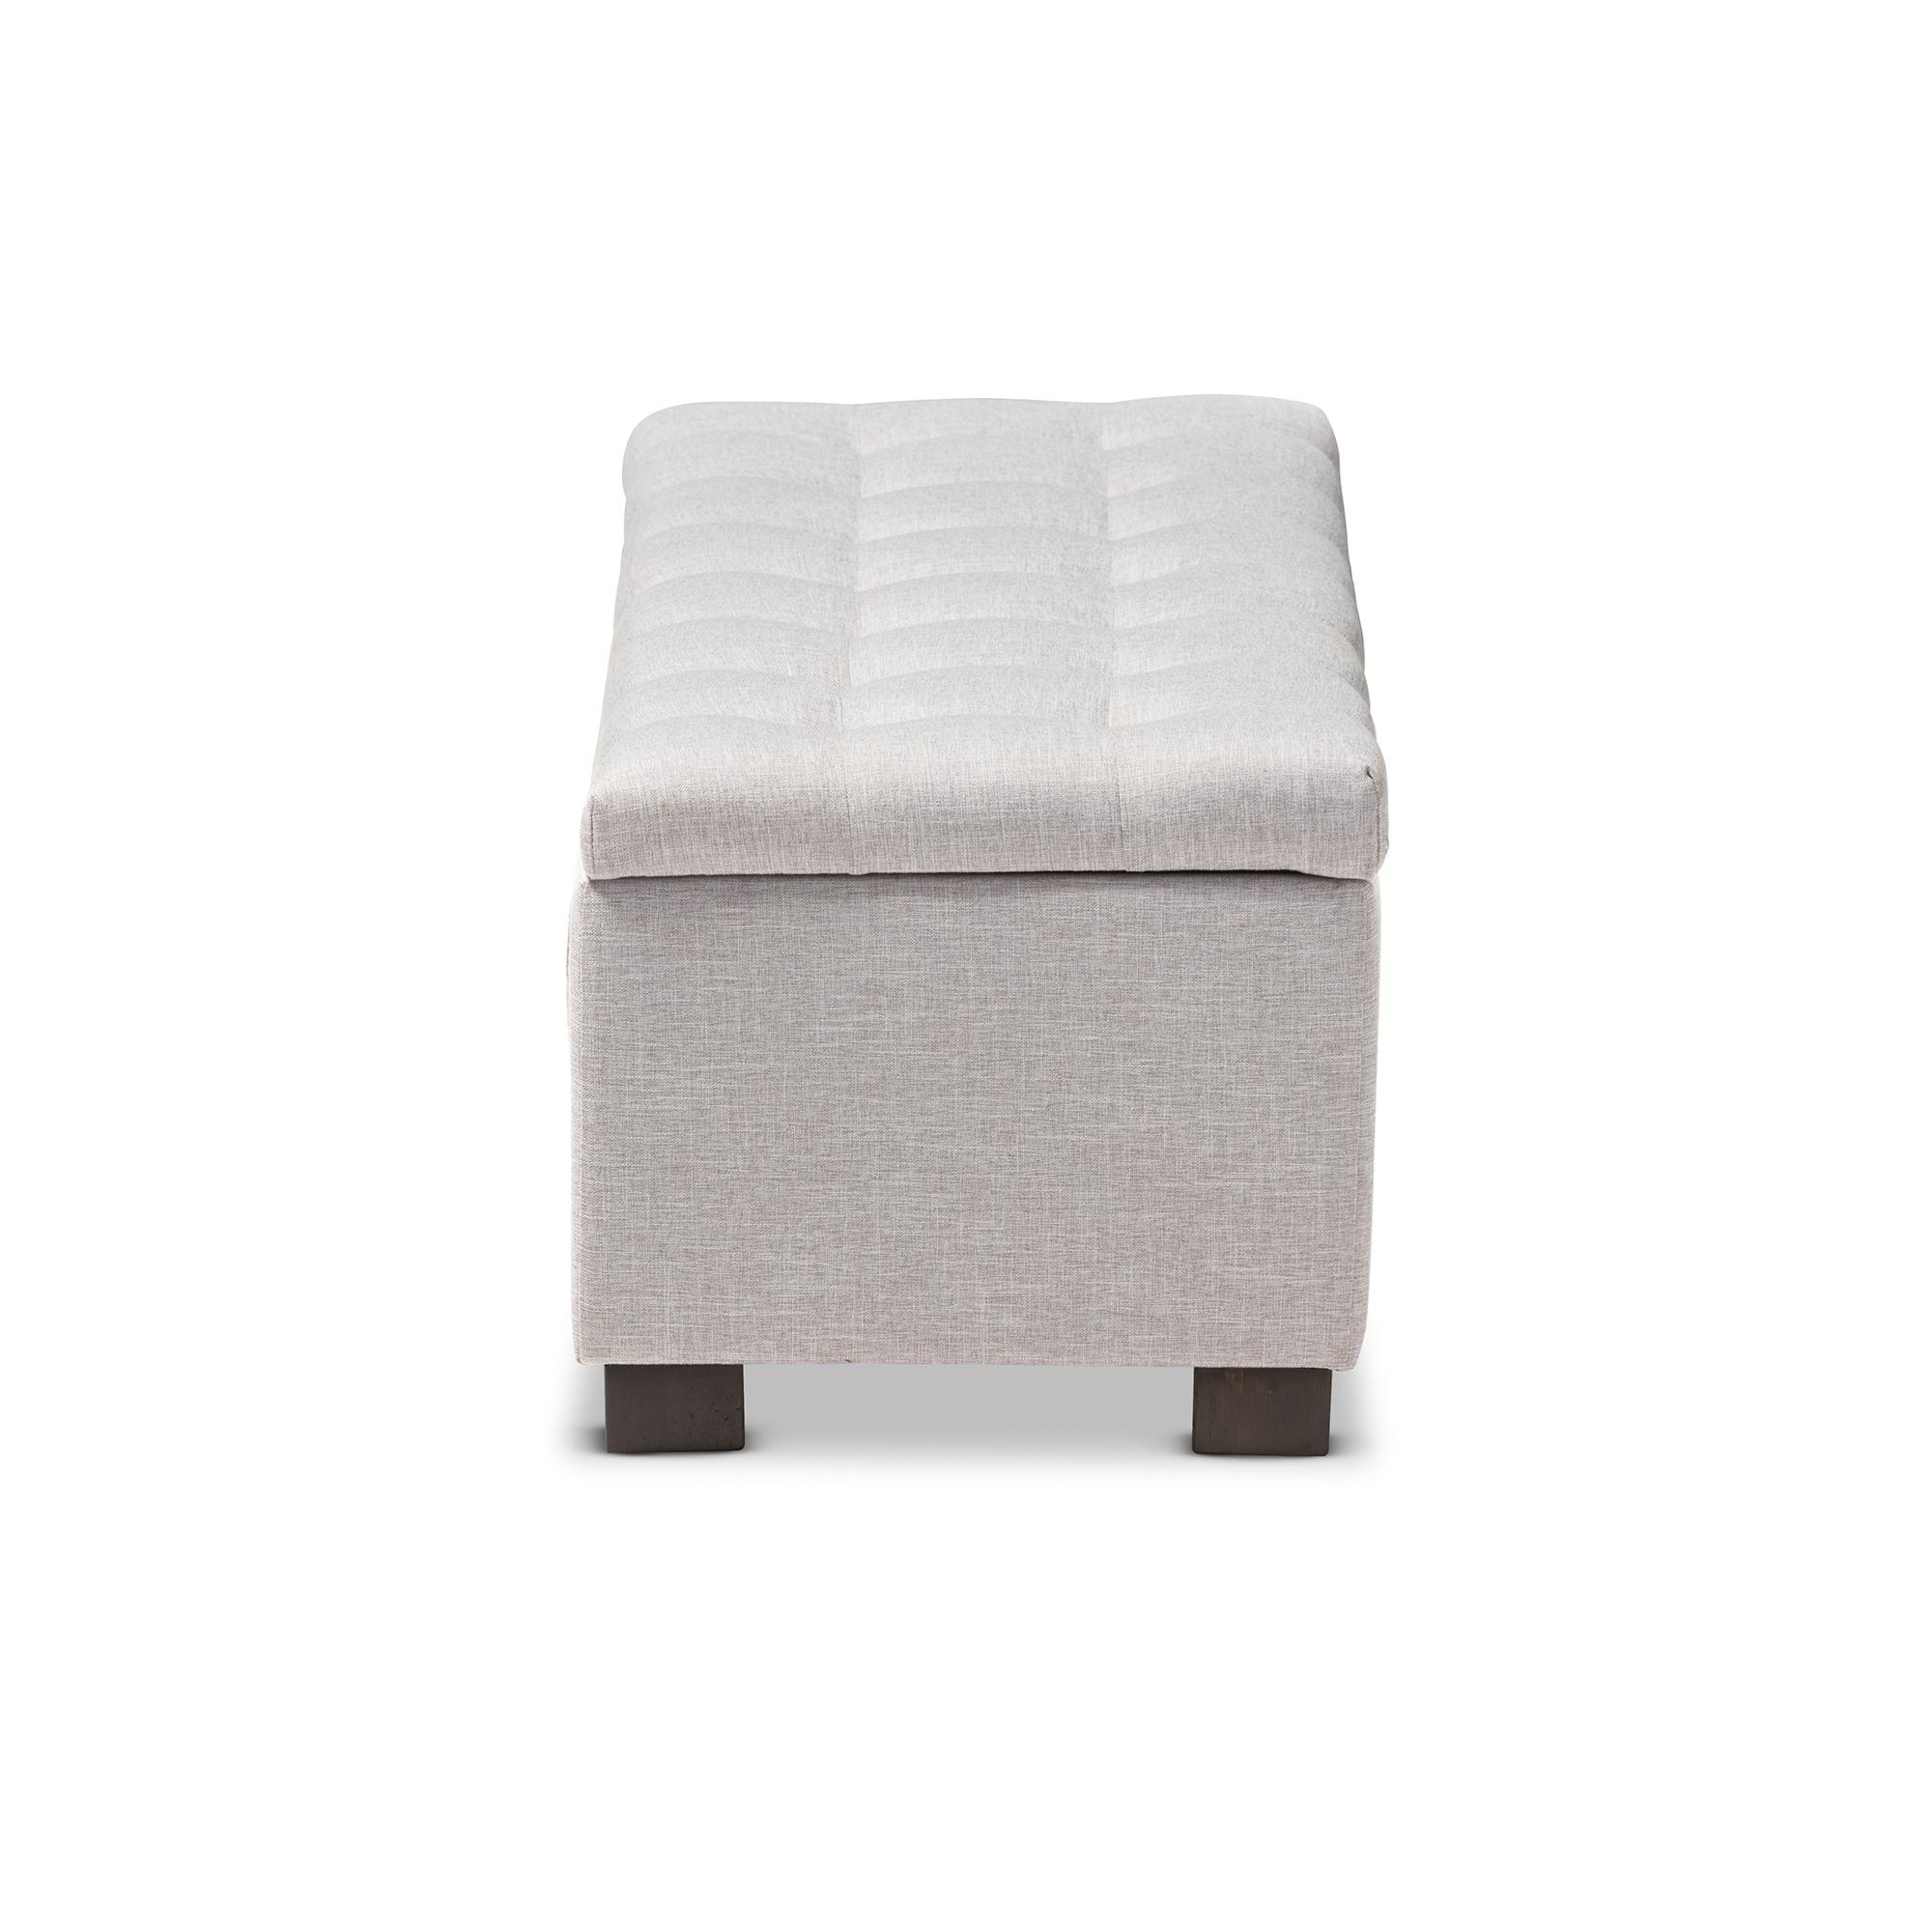 ... Baxton Studio Roanoke Modern And Contemporary Grayish Beige Fabric  Upholstered Grid Tufting Storage Ottoman Bench ...